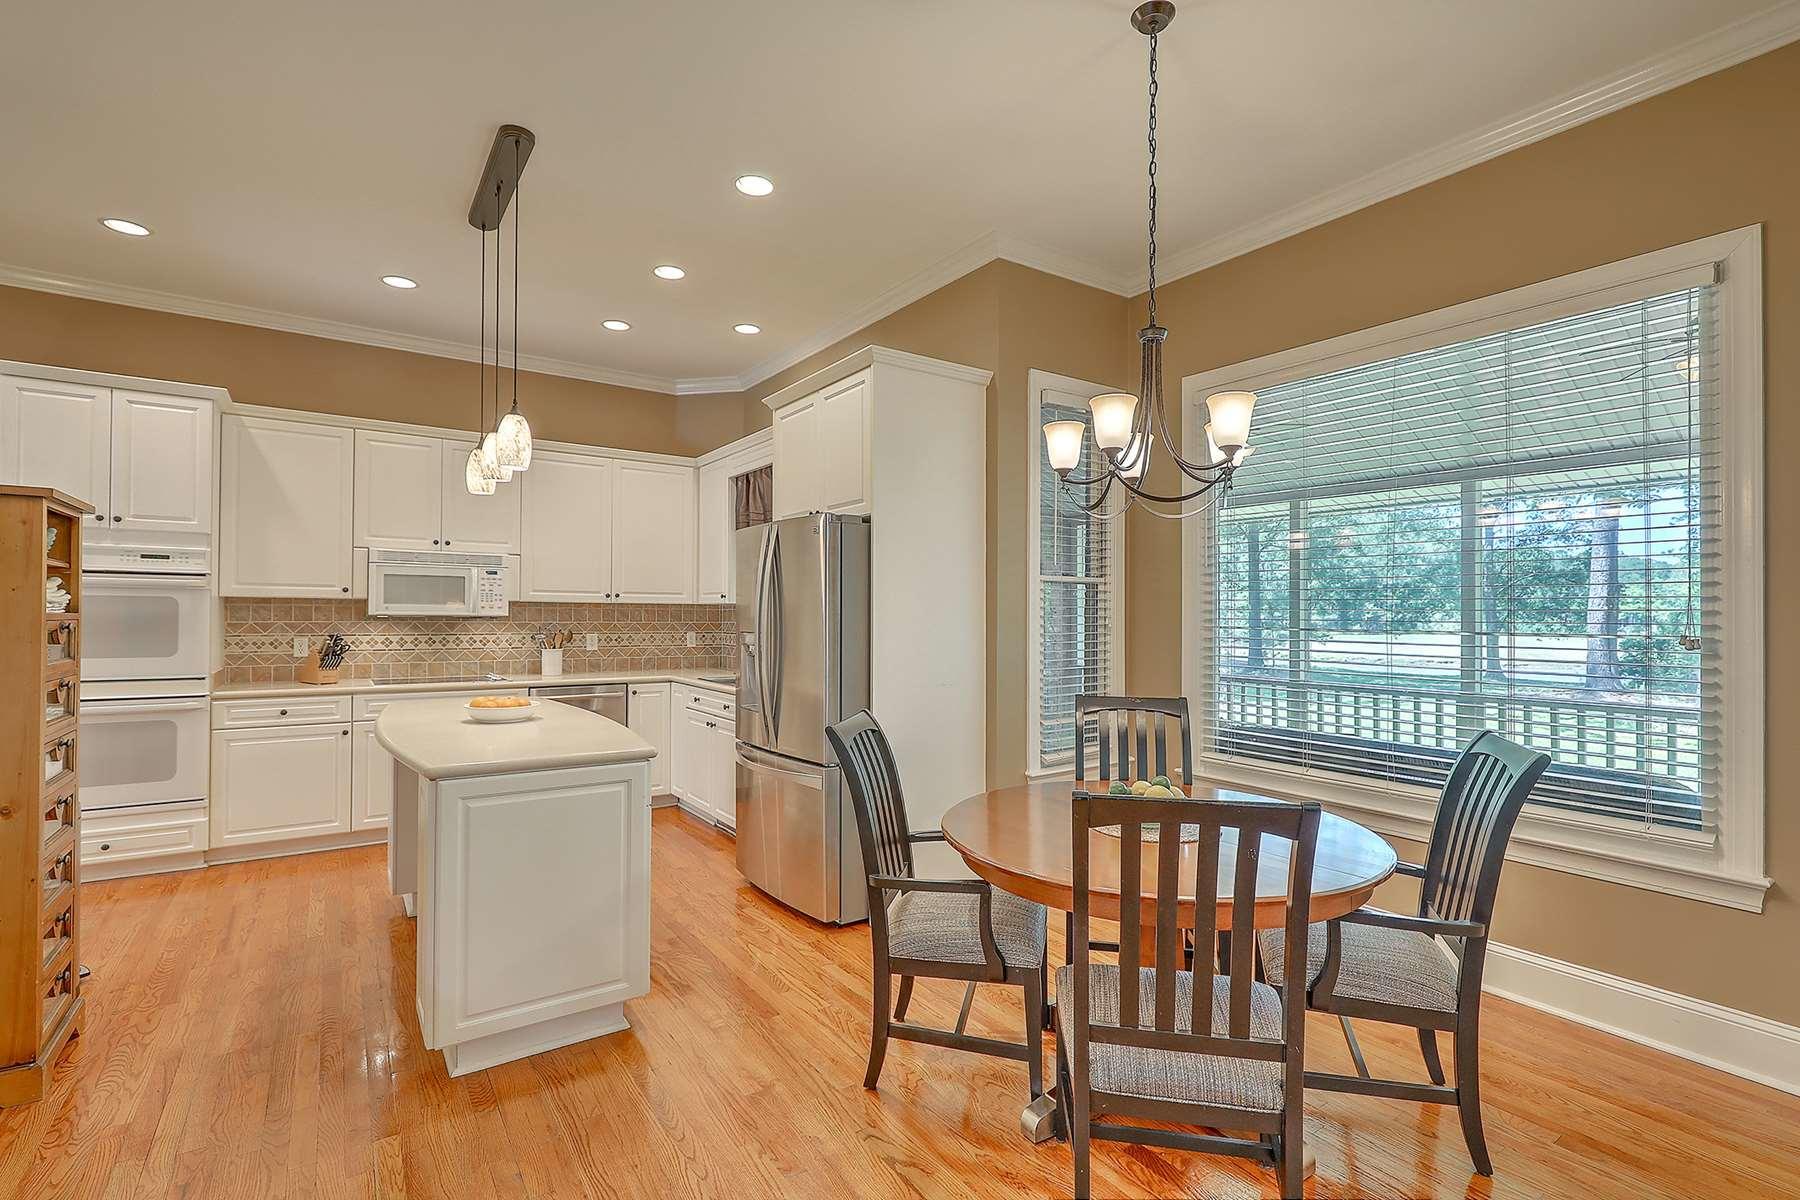 Dunes West Homes For Sale - 2961 Pignatelli, Mount Pleasant, SC - 5